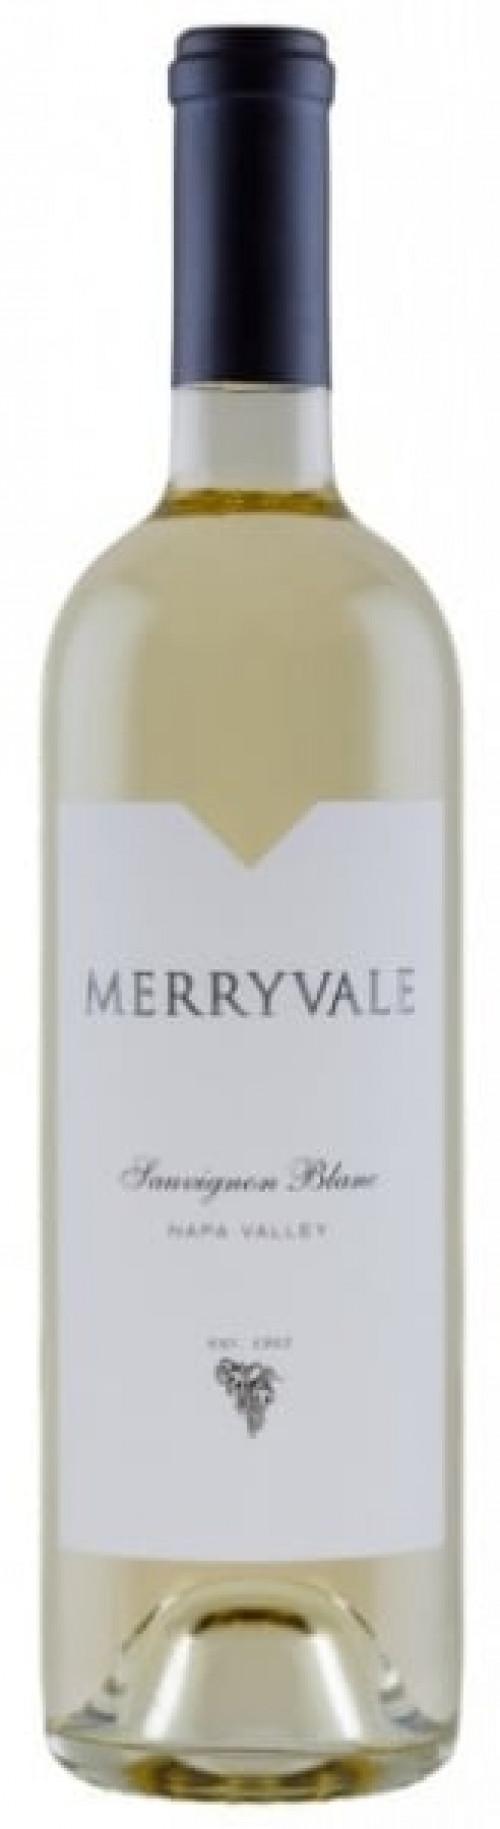 2017 Merryvale Sauvignon Blanc 750ml